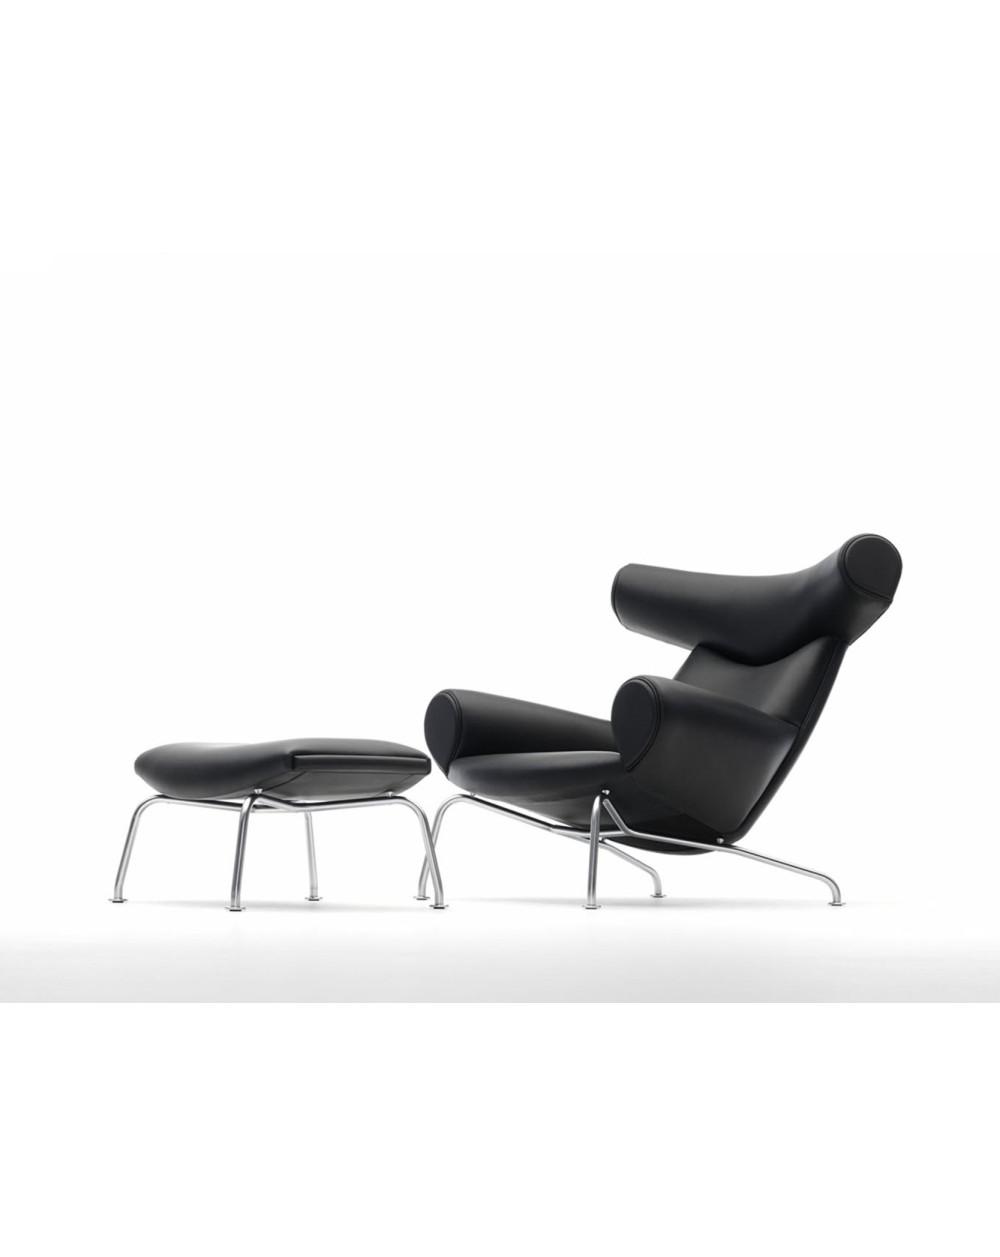 OX chair, Hans J. Wegner design